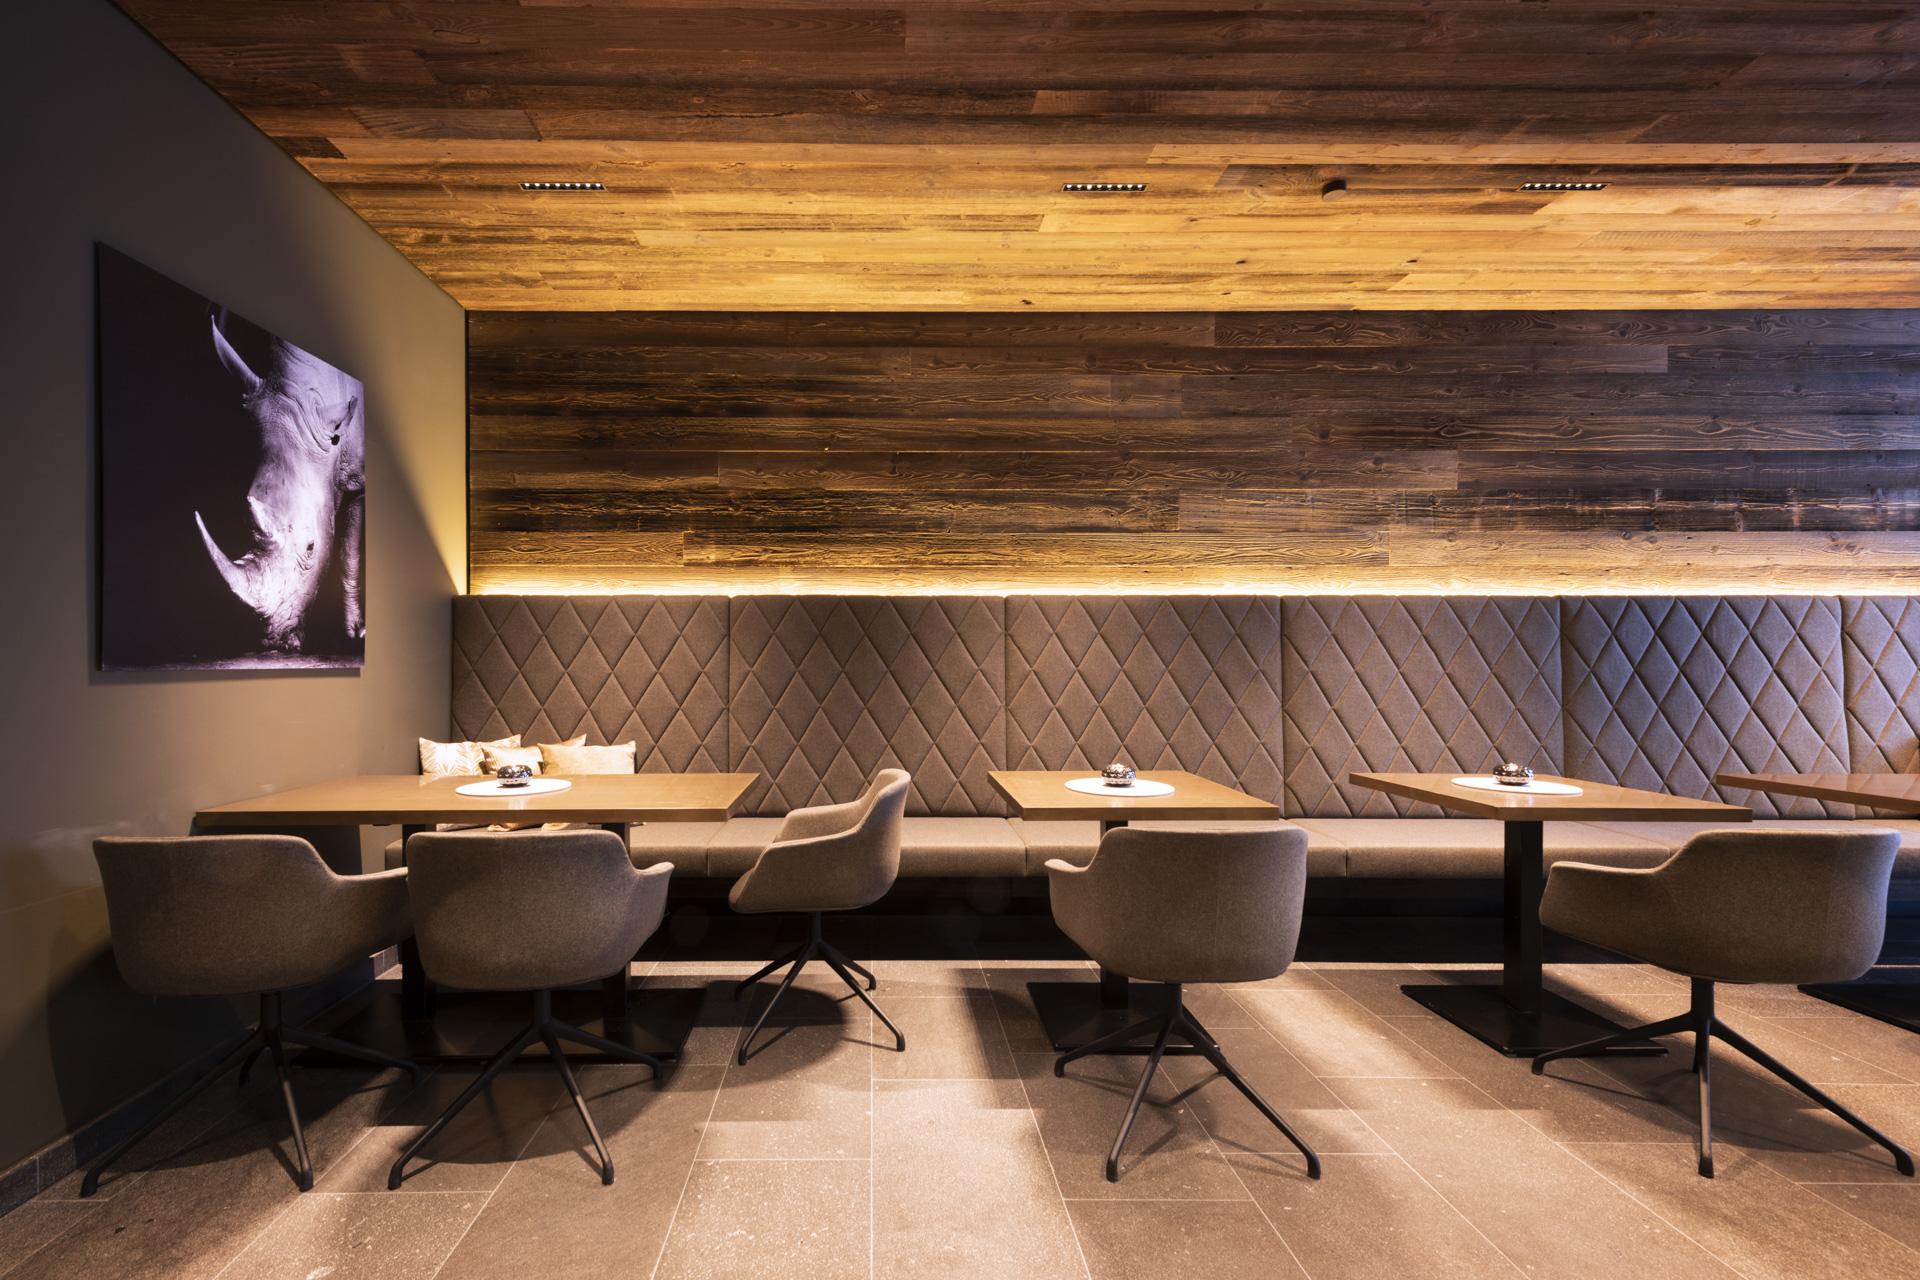 Tischlerei-Decker-Projekte-Mountain-Chalet-Kirchberg-Fruehstueck-Bar-Lounge